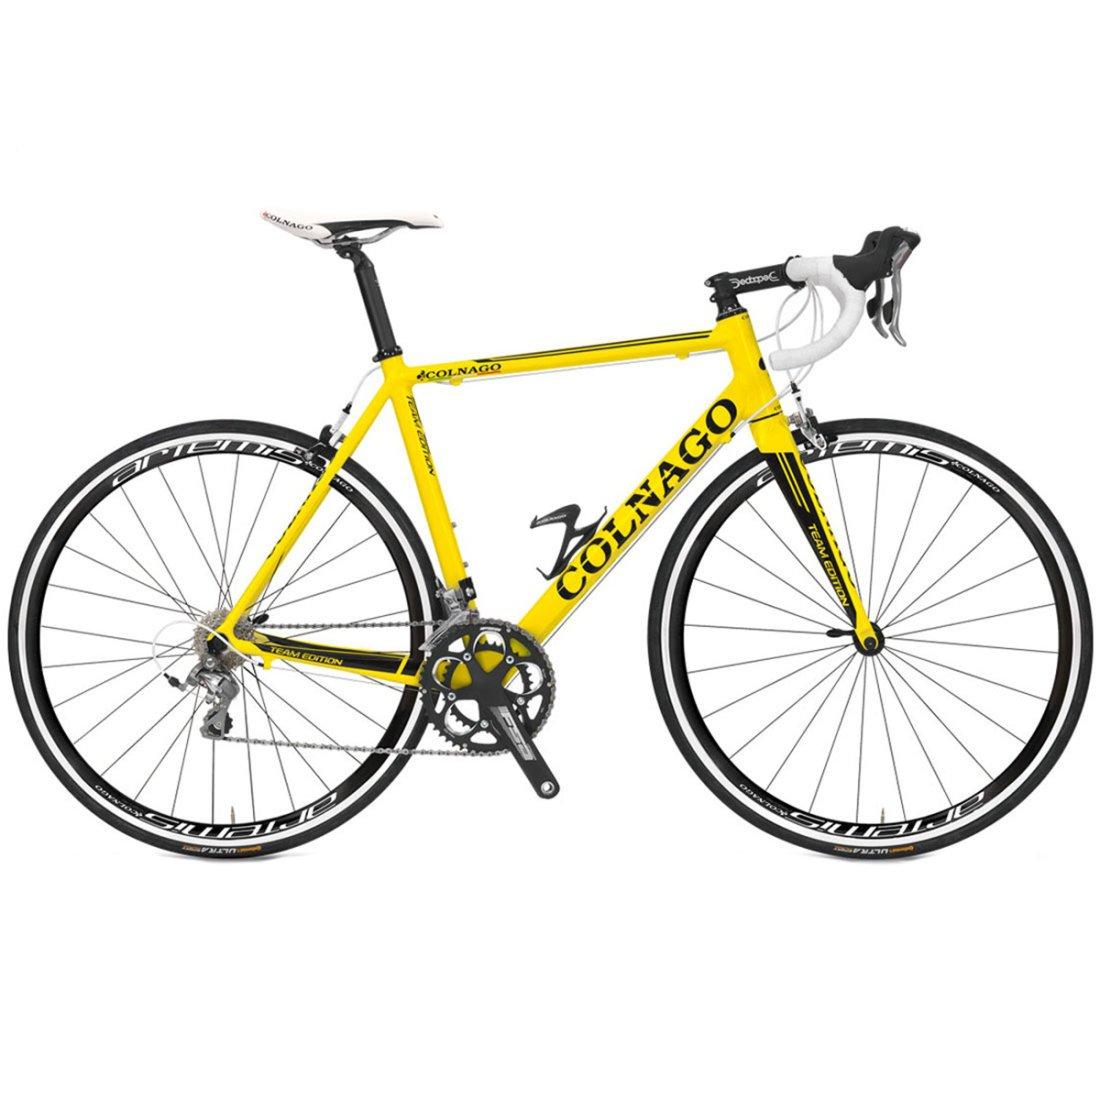 Rennrad COLNAGO Strada SL 105 2015 Yellow · Motocard